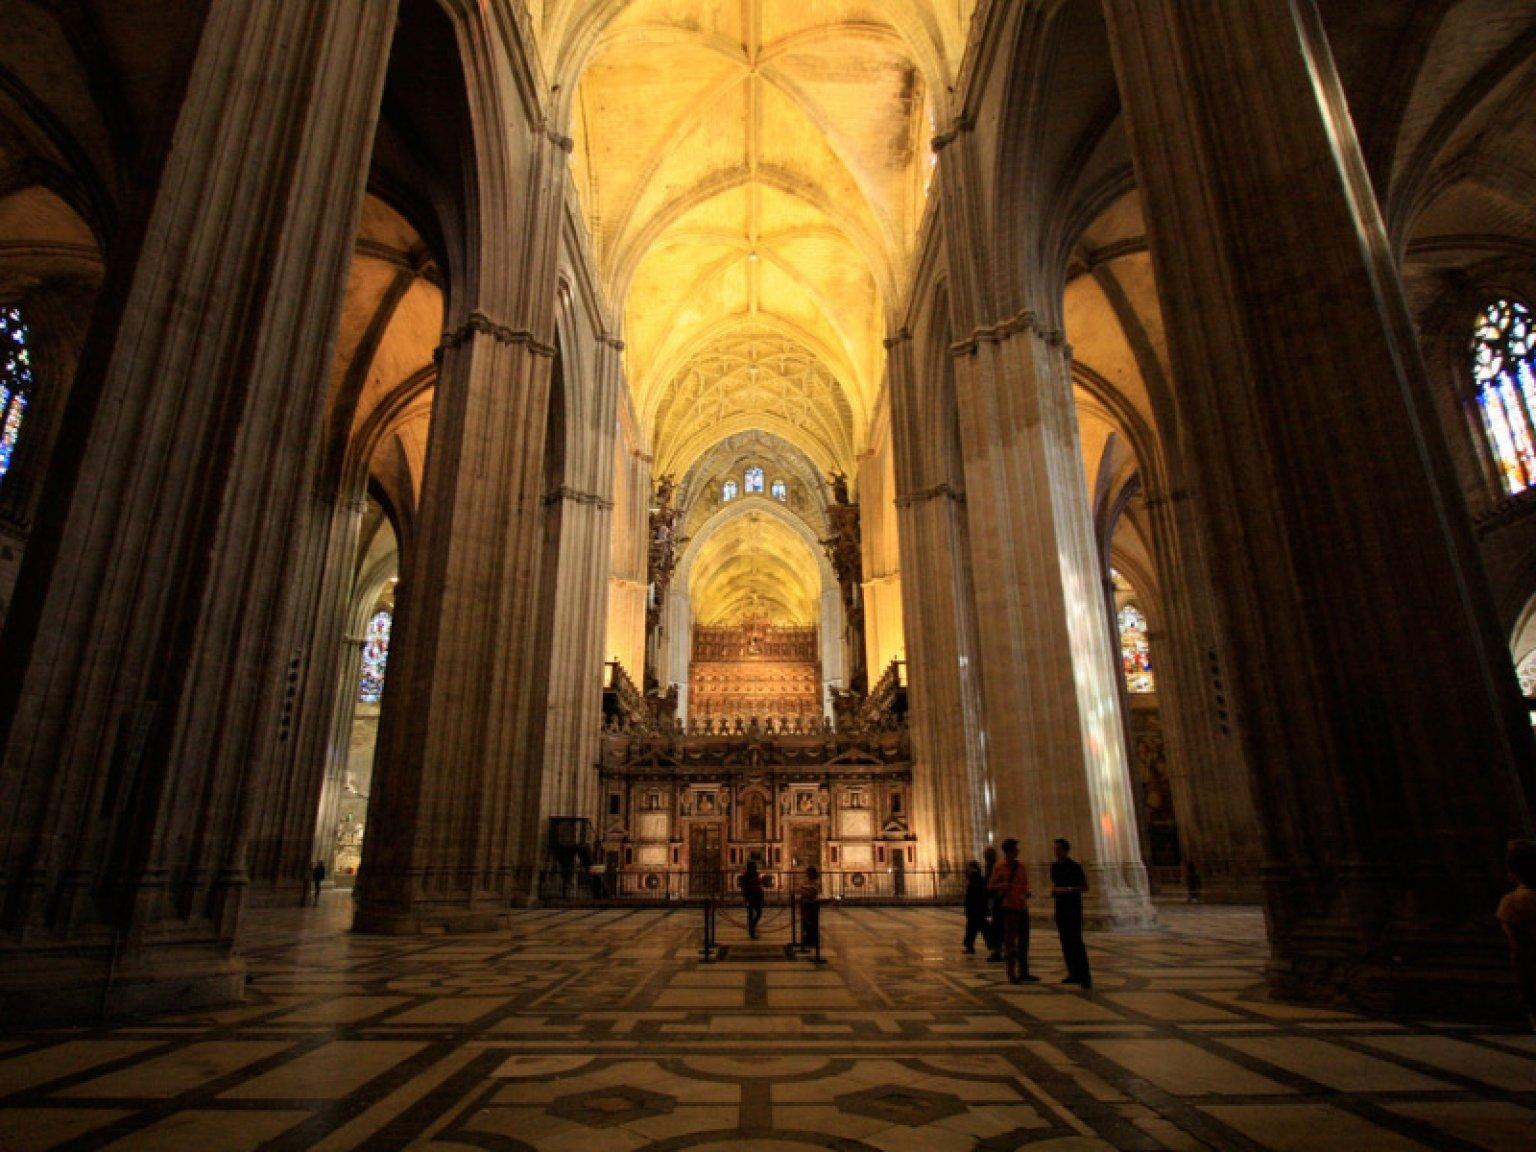 Oferta visita guiada catedral de sevilla - Catedral de sevilla interior ...